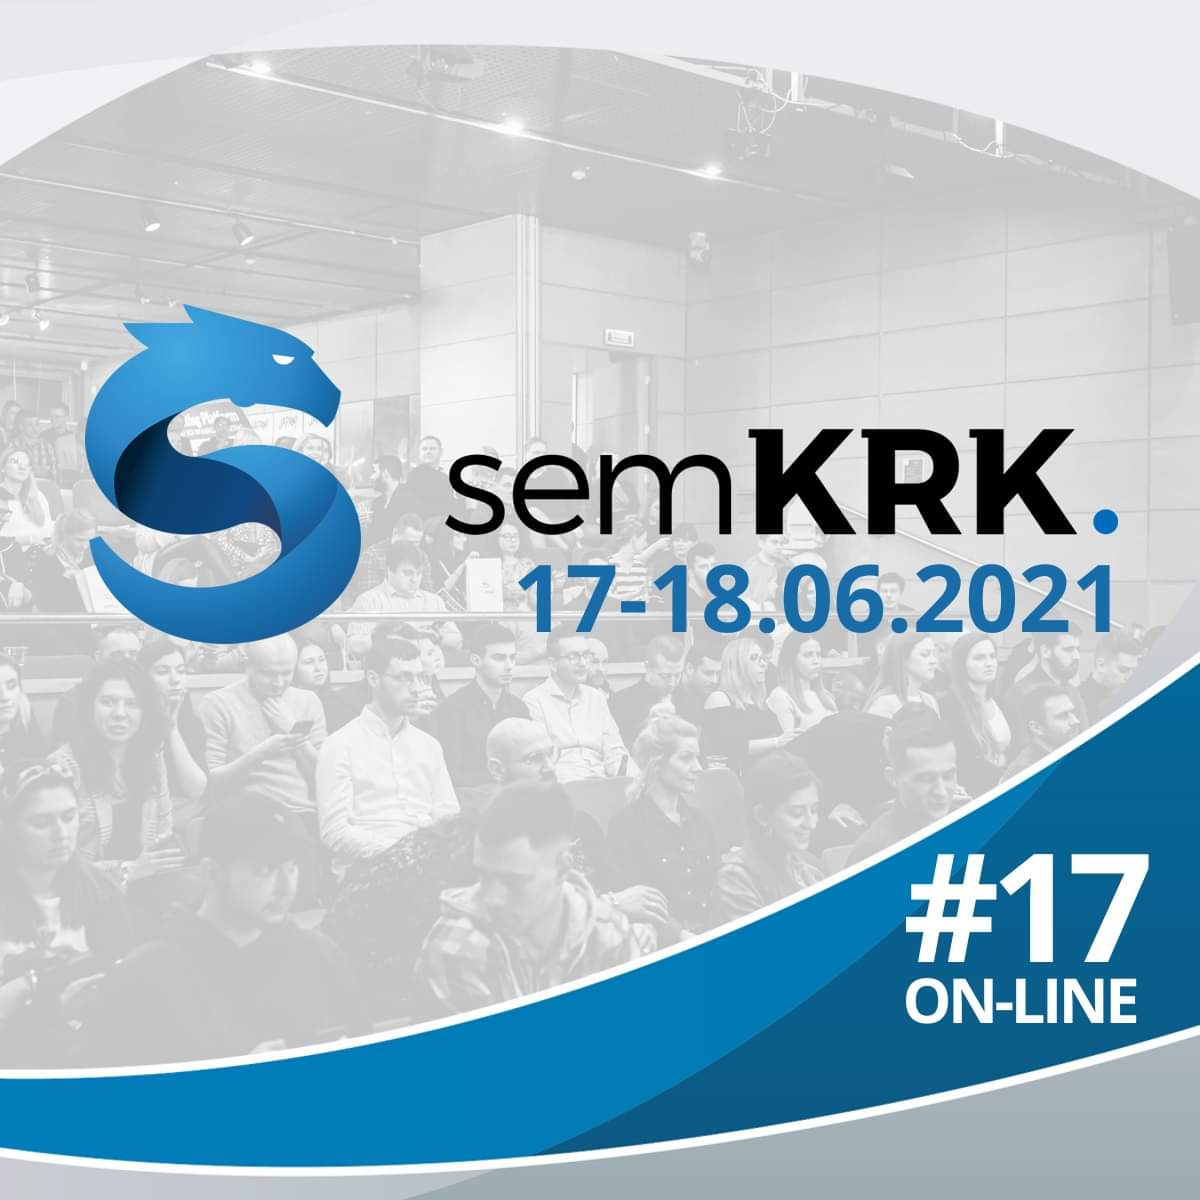 SemKRK 17-18.06.2021